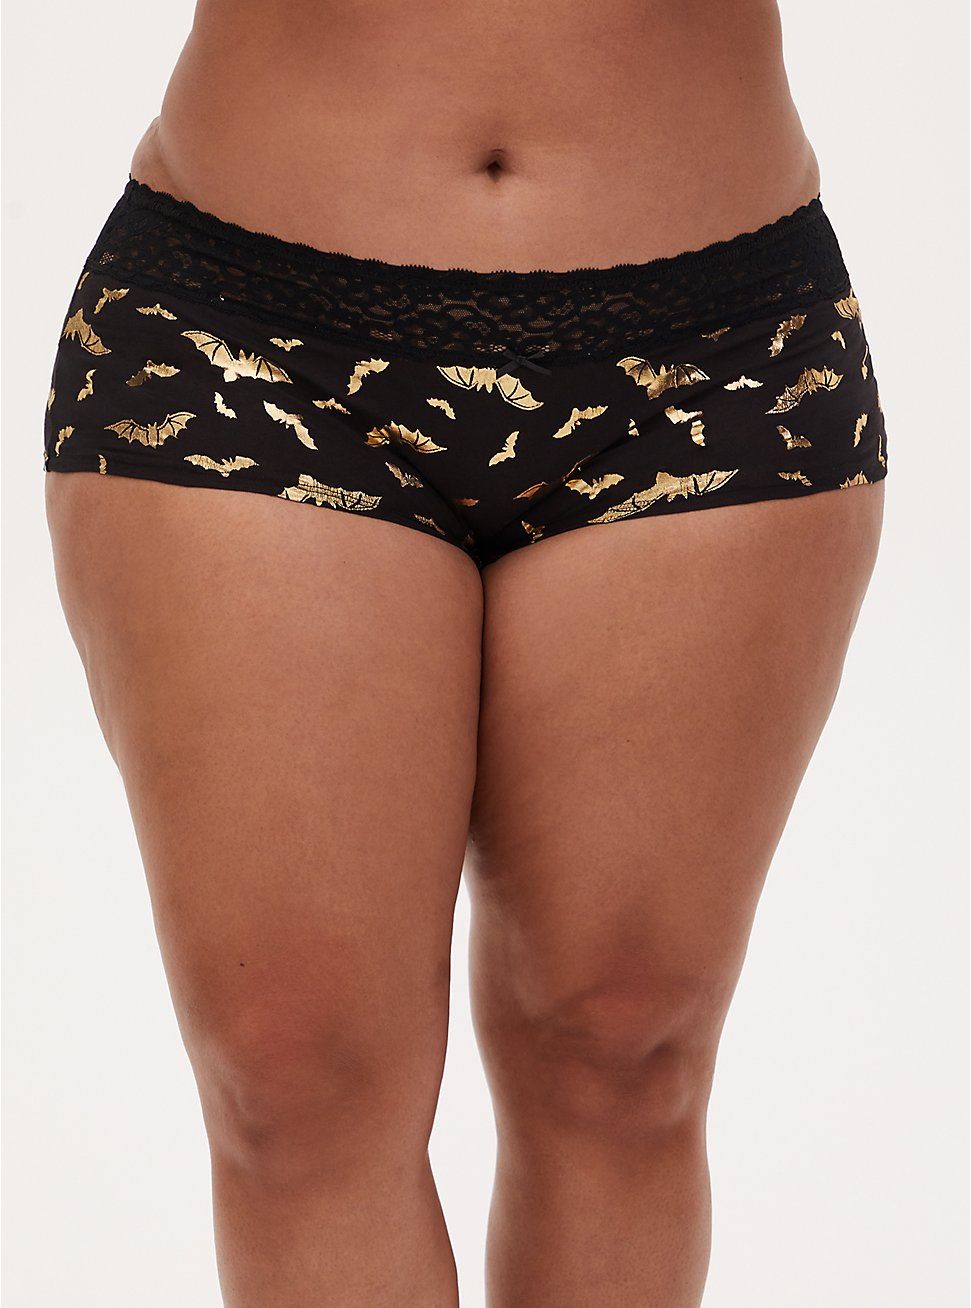 Gold Bat & Black Wide Lace Cotton Boyshort Panty , FLYING BATS, hi-res